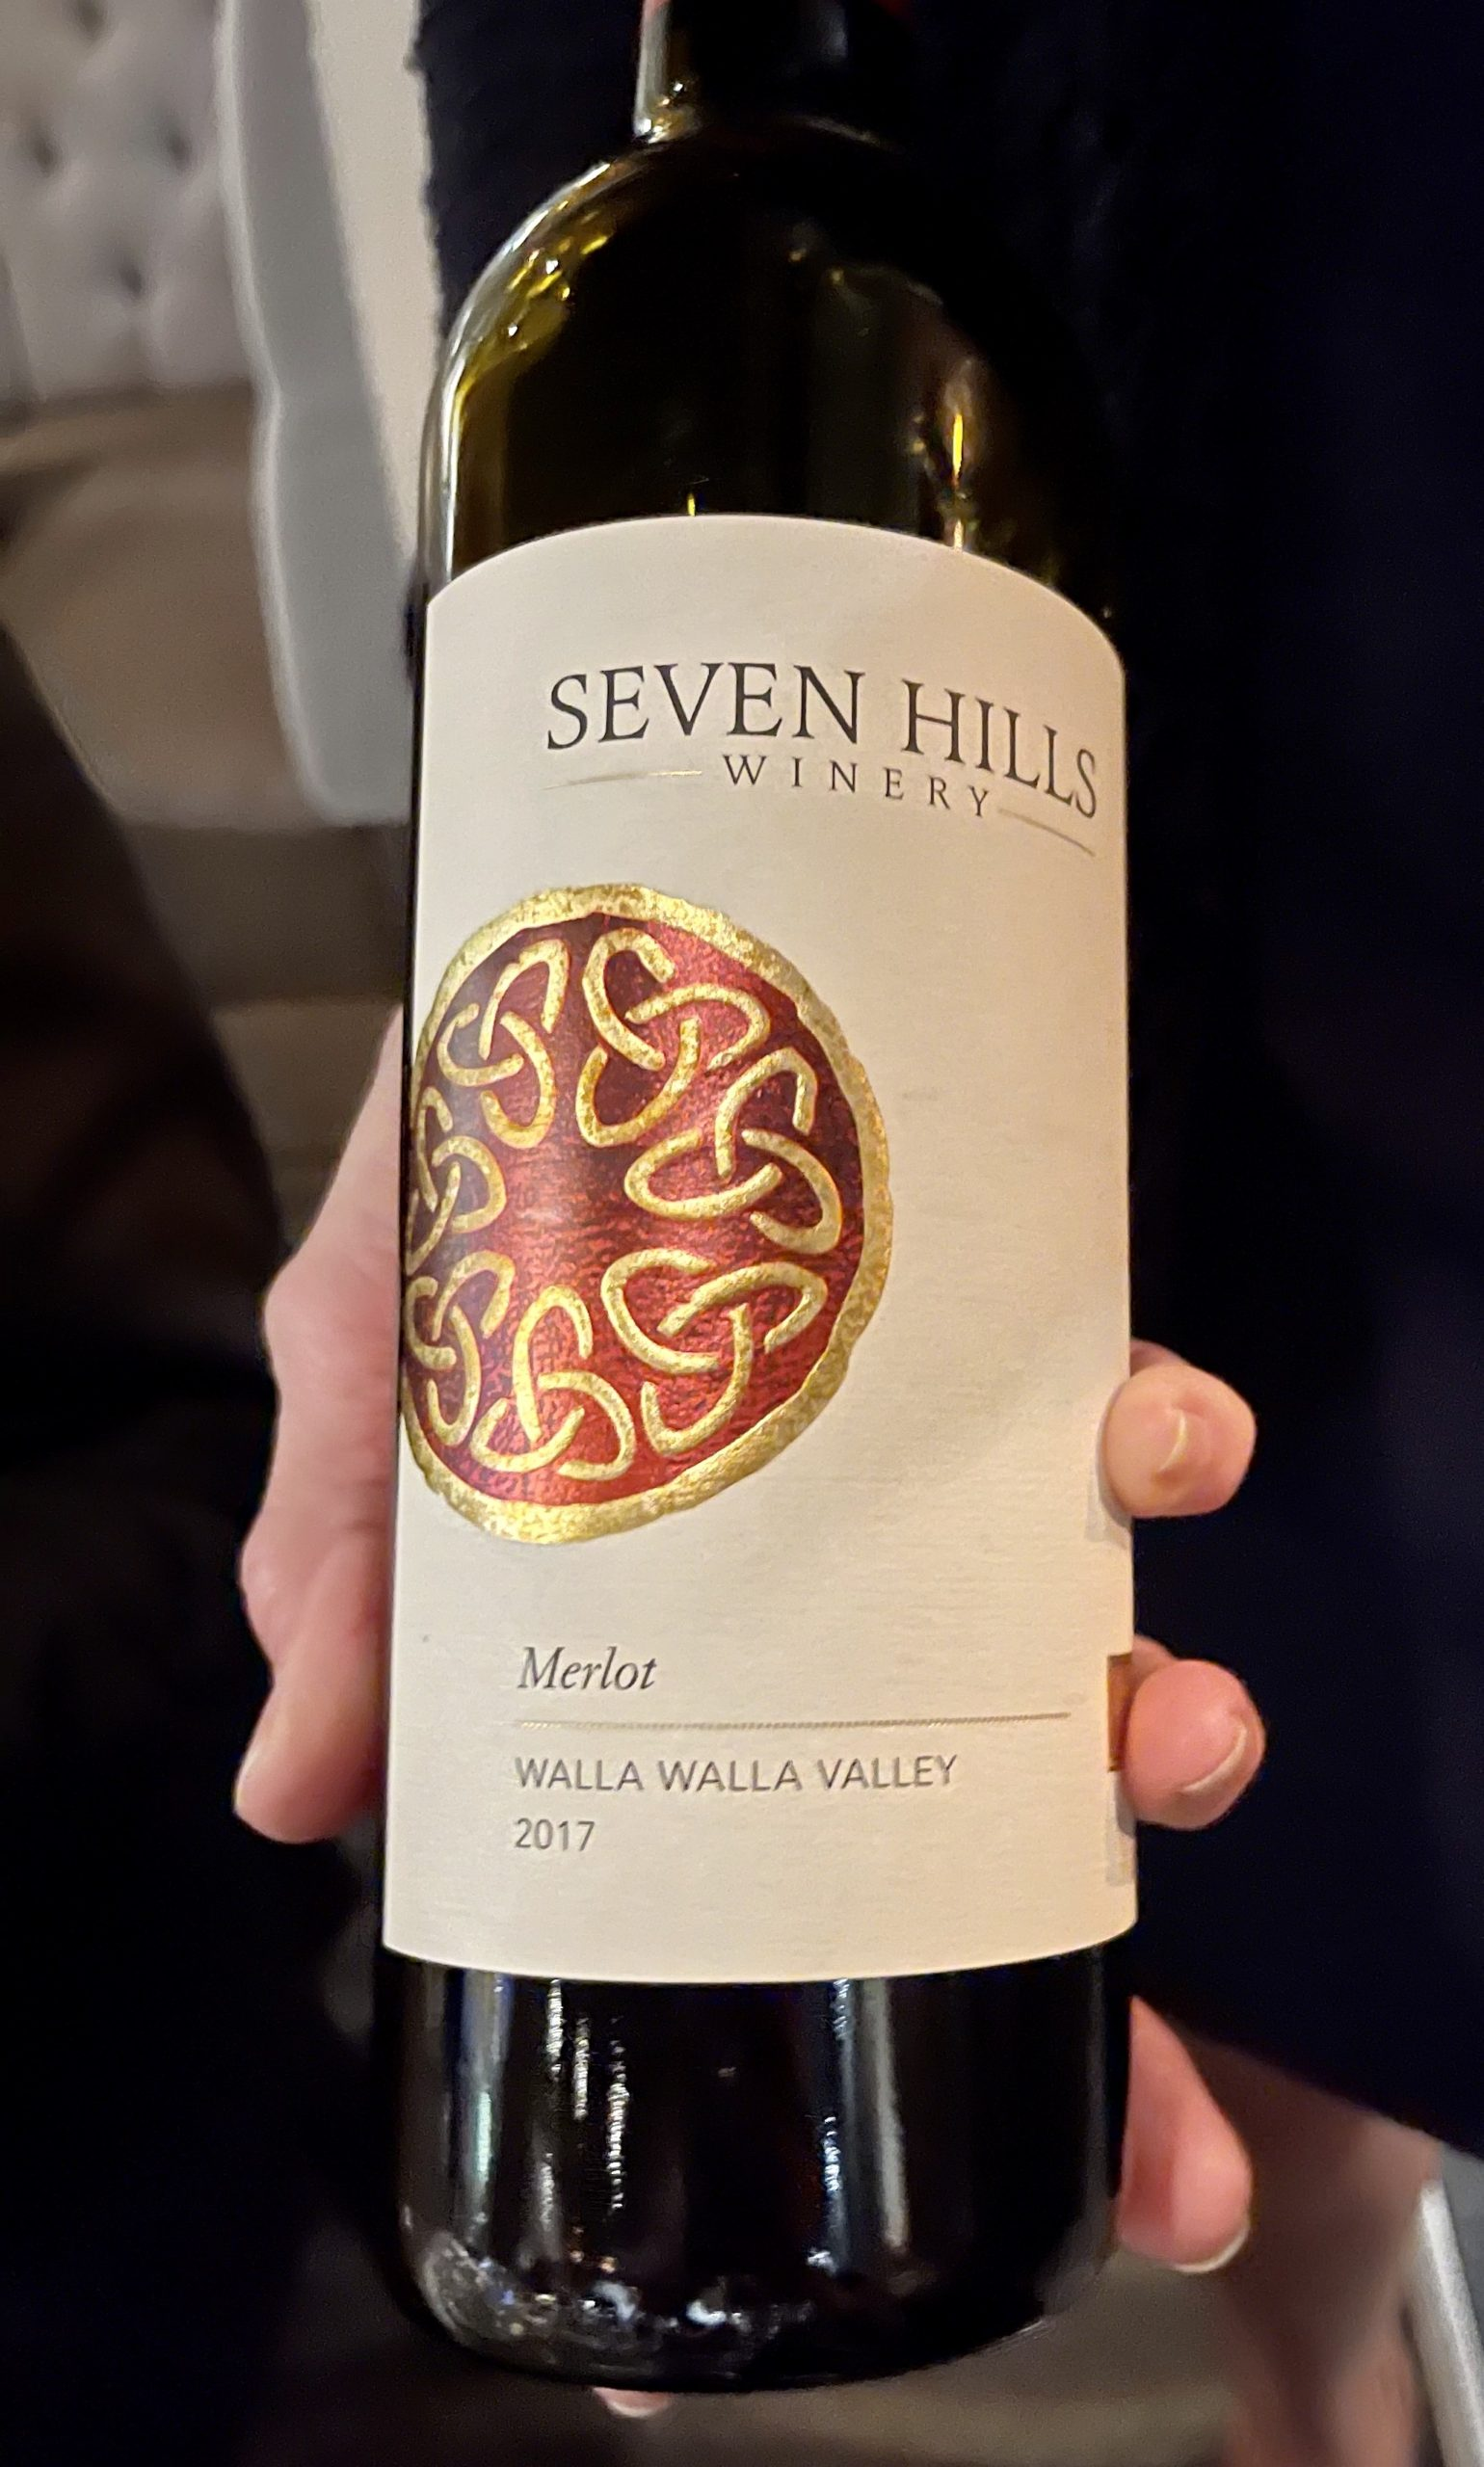 Sea Salt - Seven Hills Winery New World Merlot Walla Walla Valley 2017